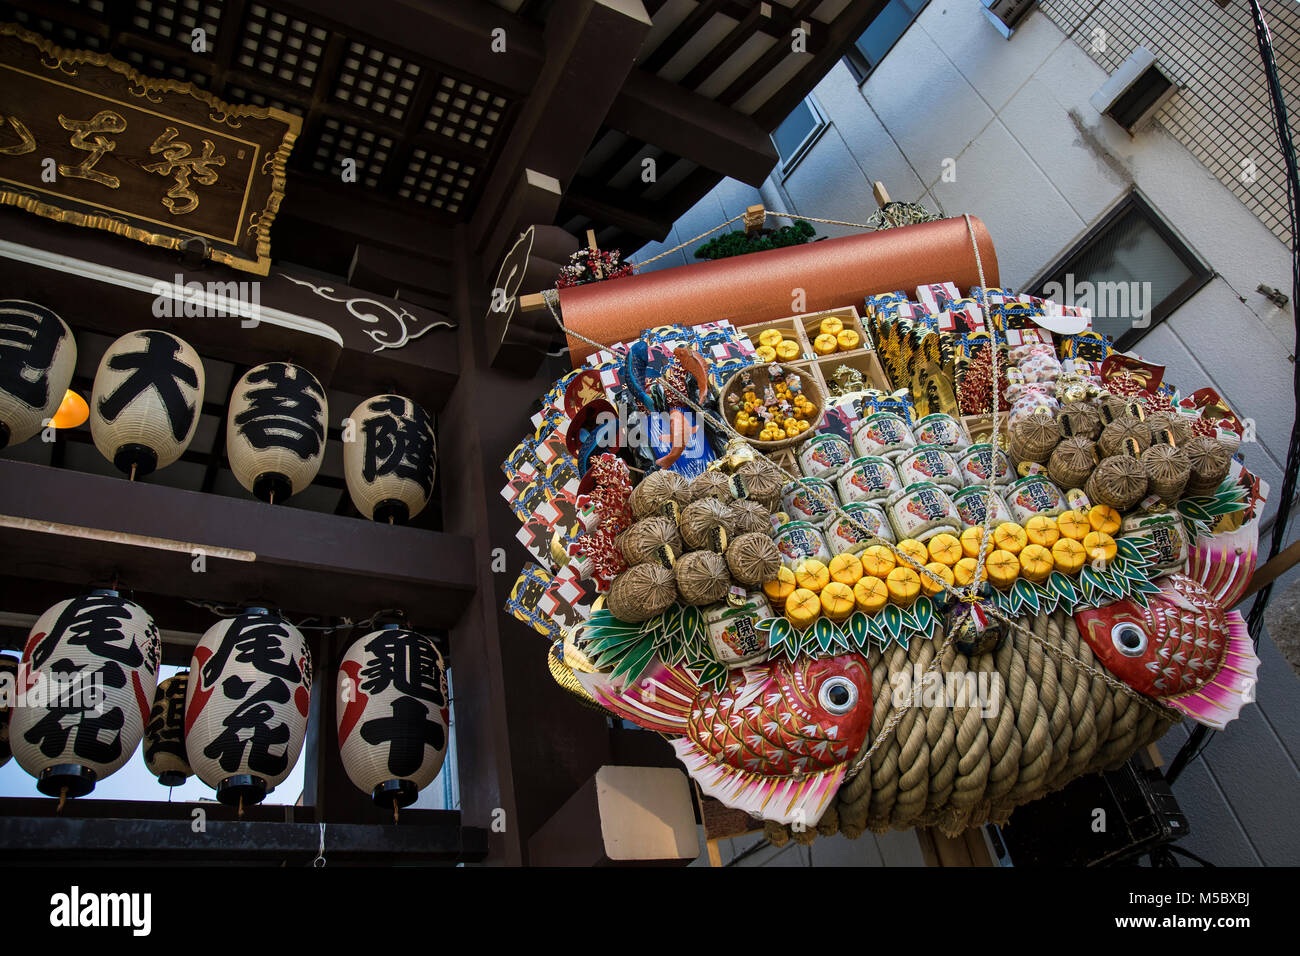 The Tori-No-Ichi Festival for good fortune at the Otori Shrine in Asakusa, Tokyo - Stock Image